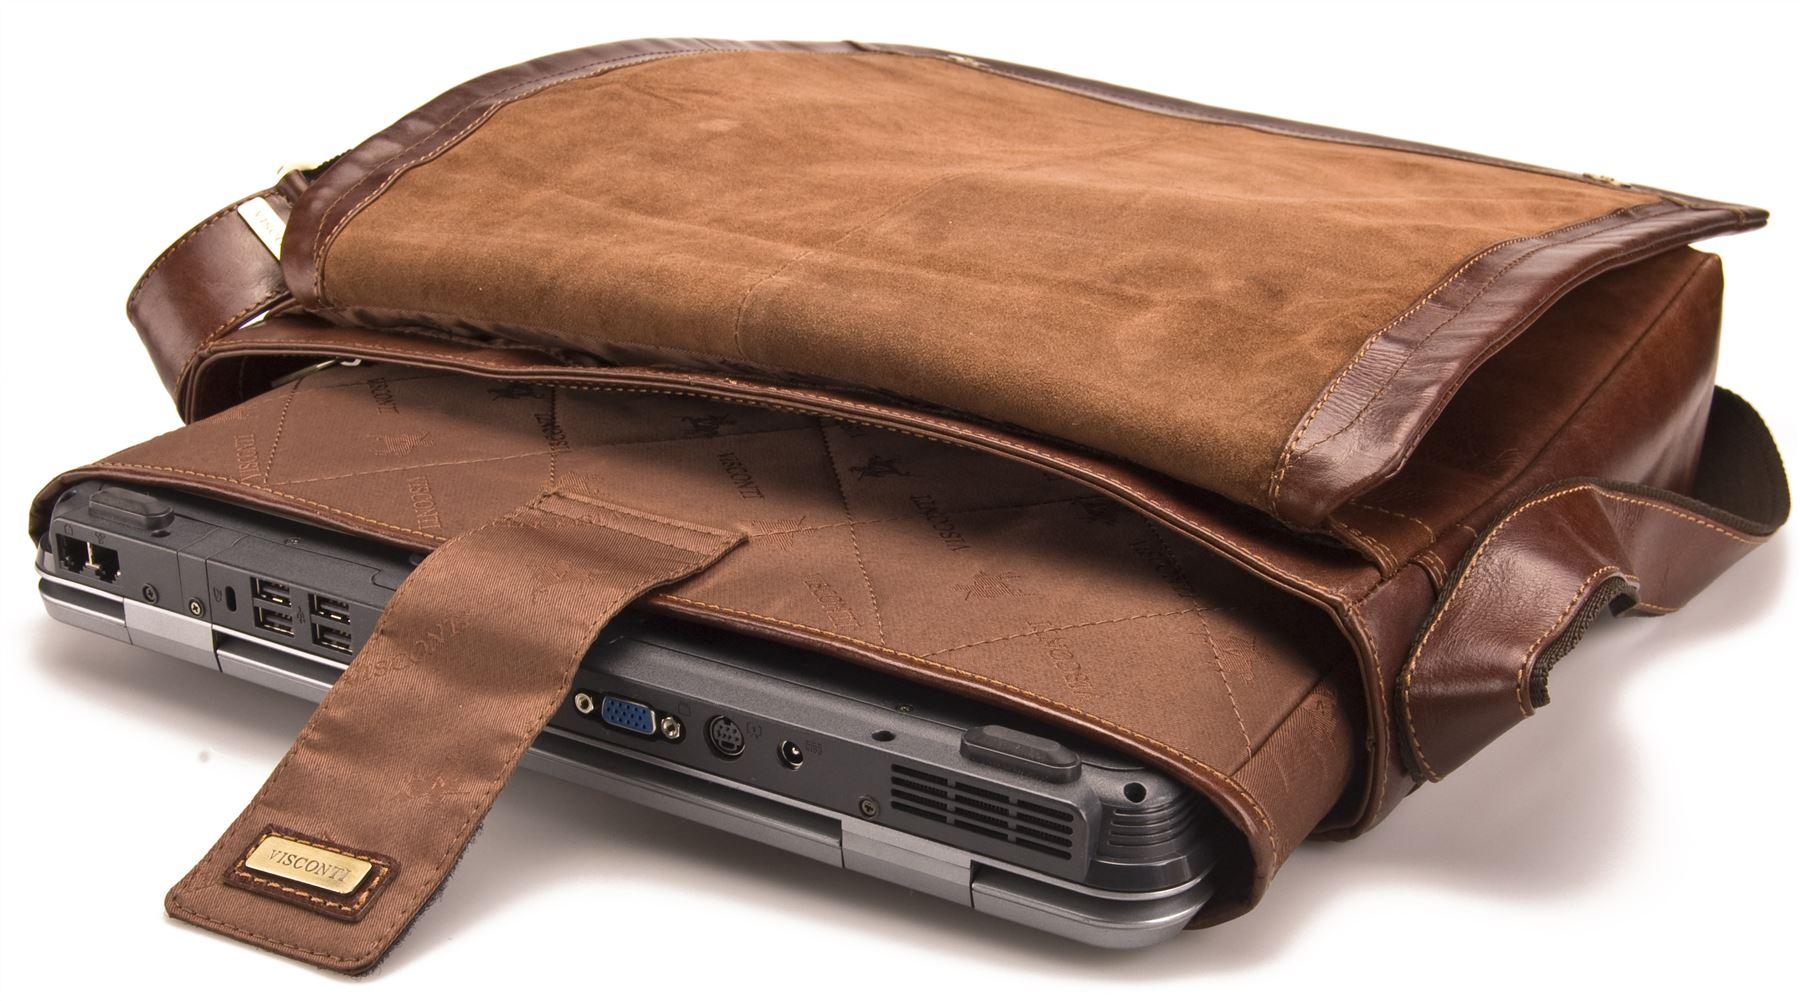 sac ordinateur portable homme femme visconti cuir vintage. Black Bedroom Furniture Sets. Home Design Ideas